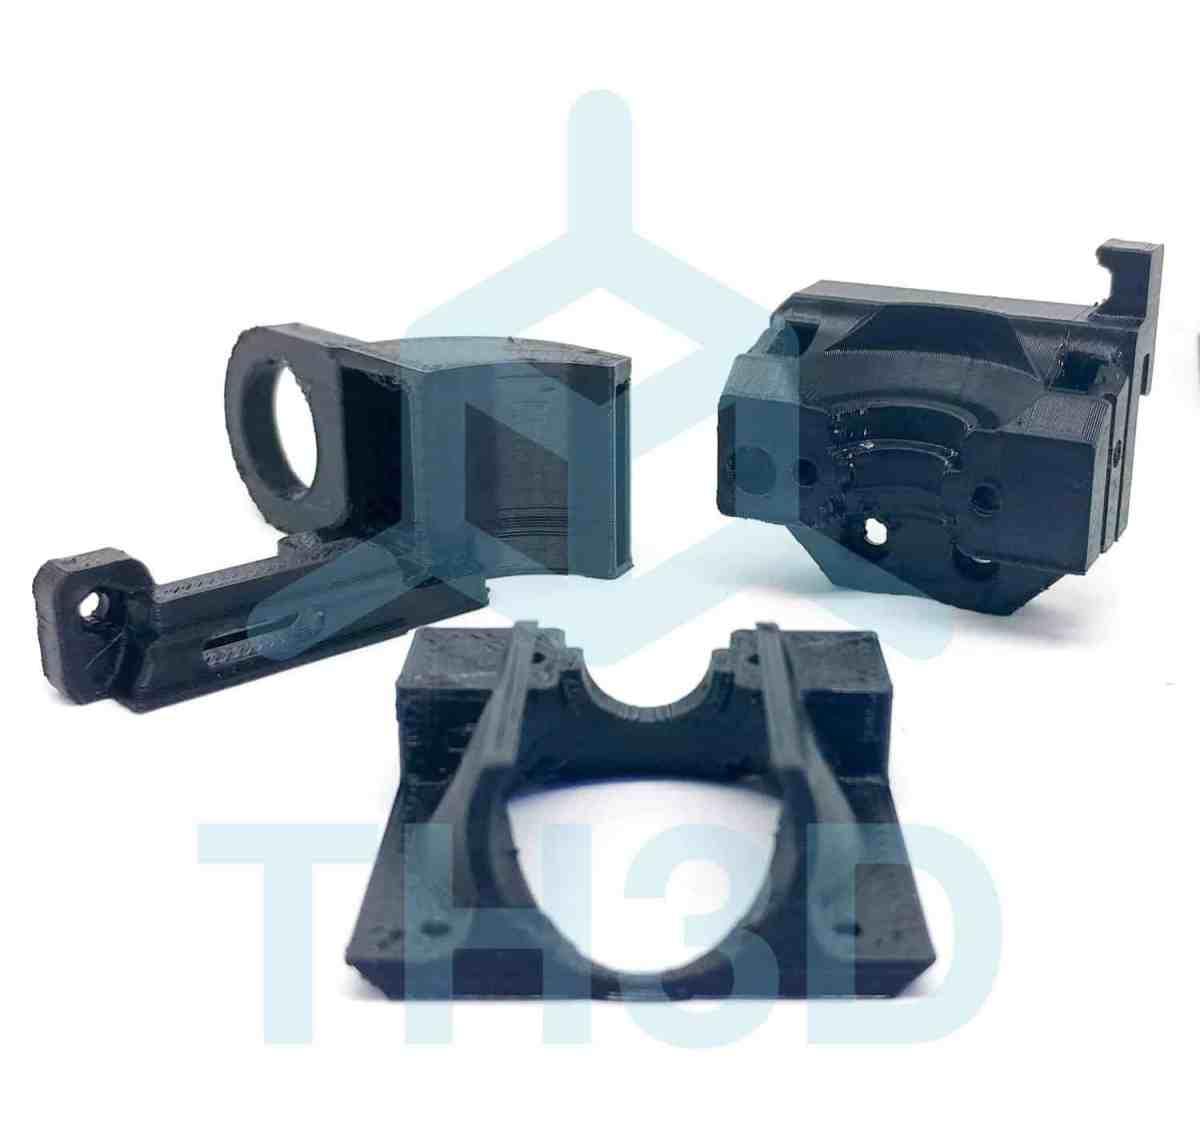 cr 10 cr 10s v6 heavy duty mount 5015 fan and ezabl abs. Black Bedroom Furniture Sets. Home Design Ideas